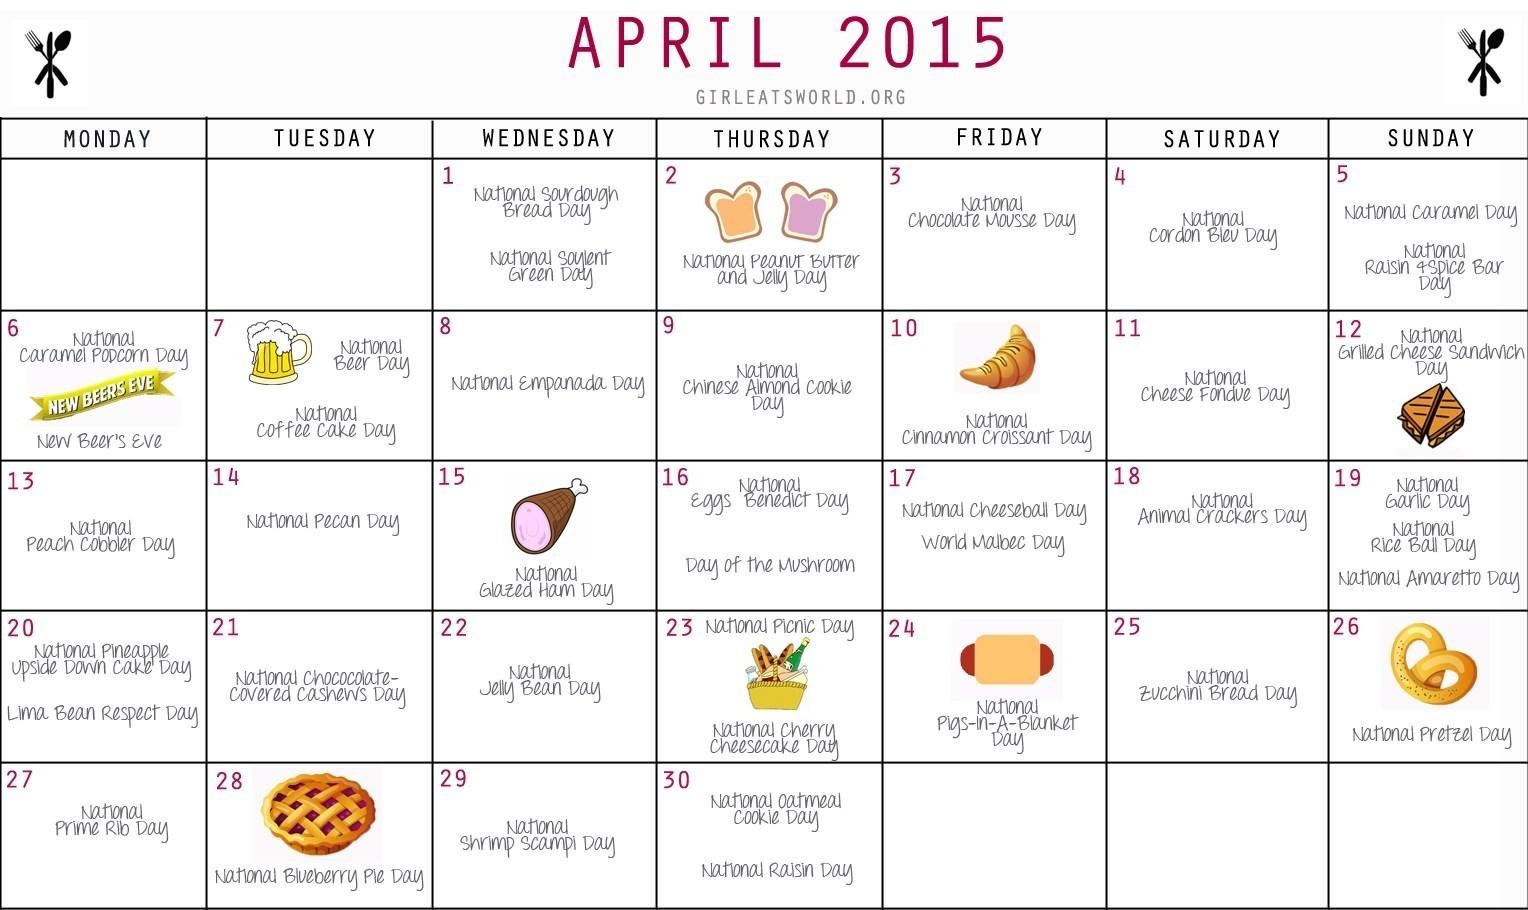 National Food Holidays April 2015 | Girl Eats World-Calendar With National Food Holidays